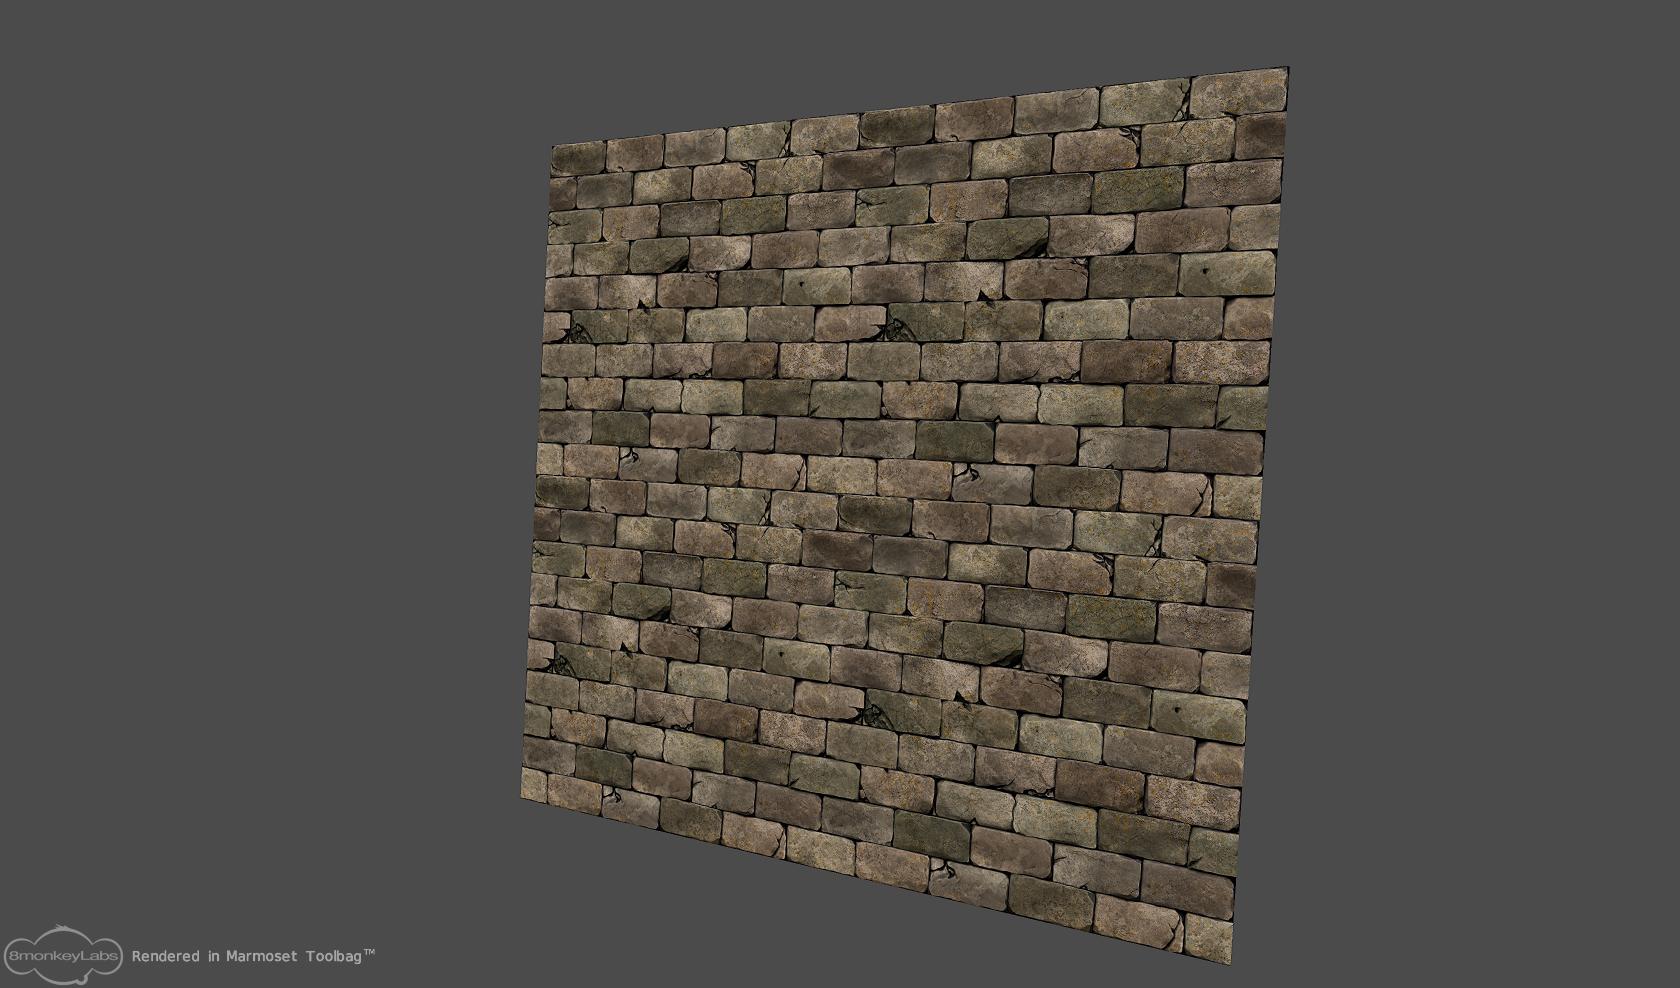 20120803_brick_wall_02b_2x2.jpg